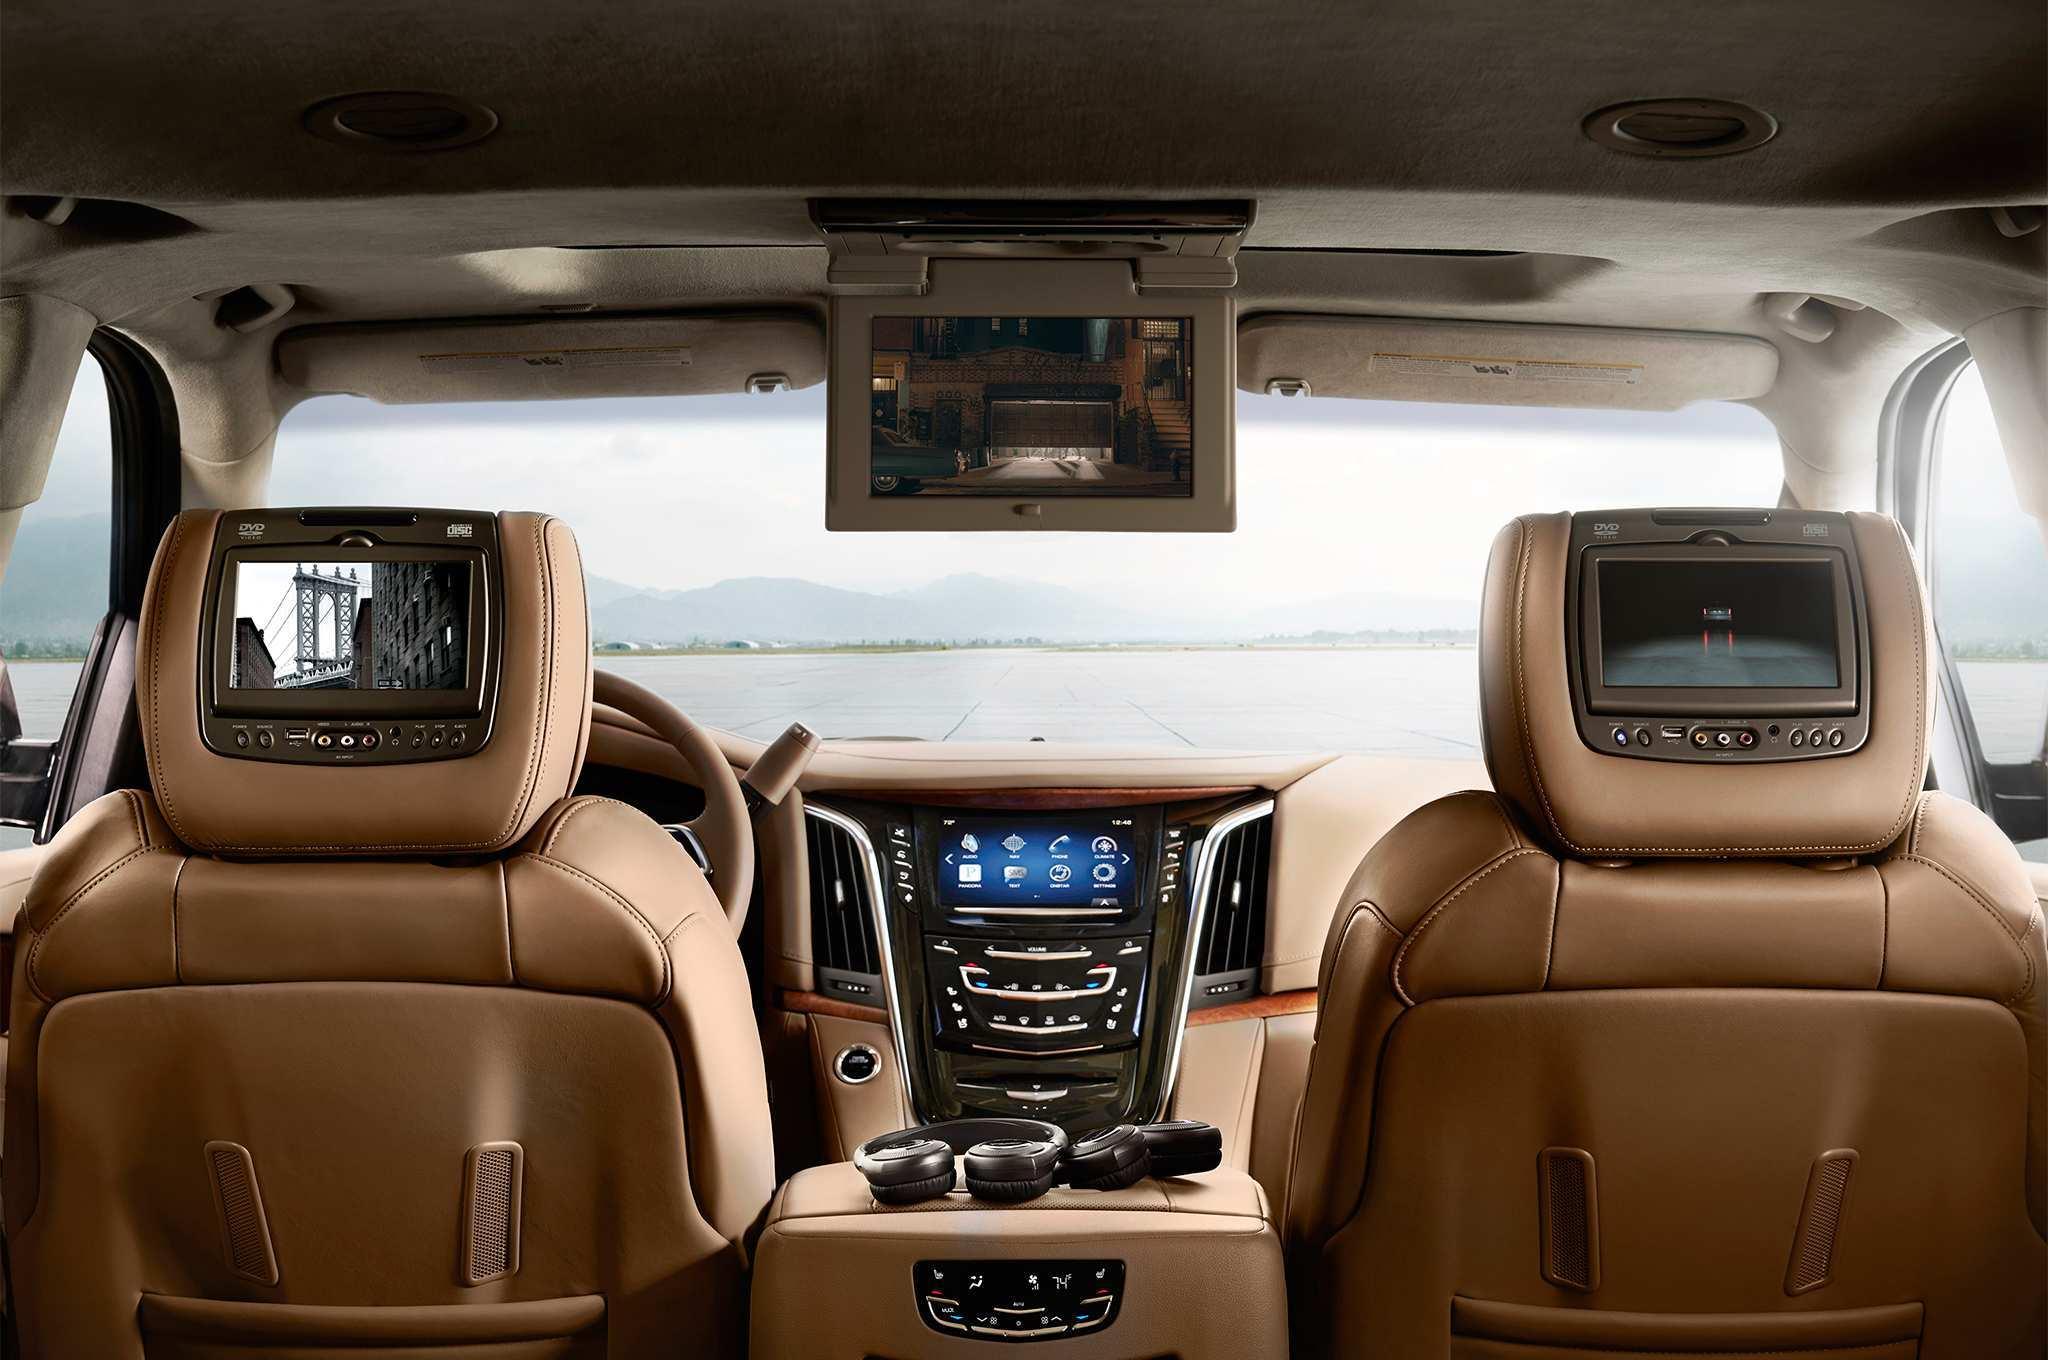 19 New 2019 Cadillac Escalade Interior Performance by 2019 Cadillac Escalade Interior